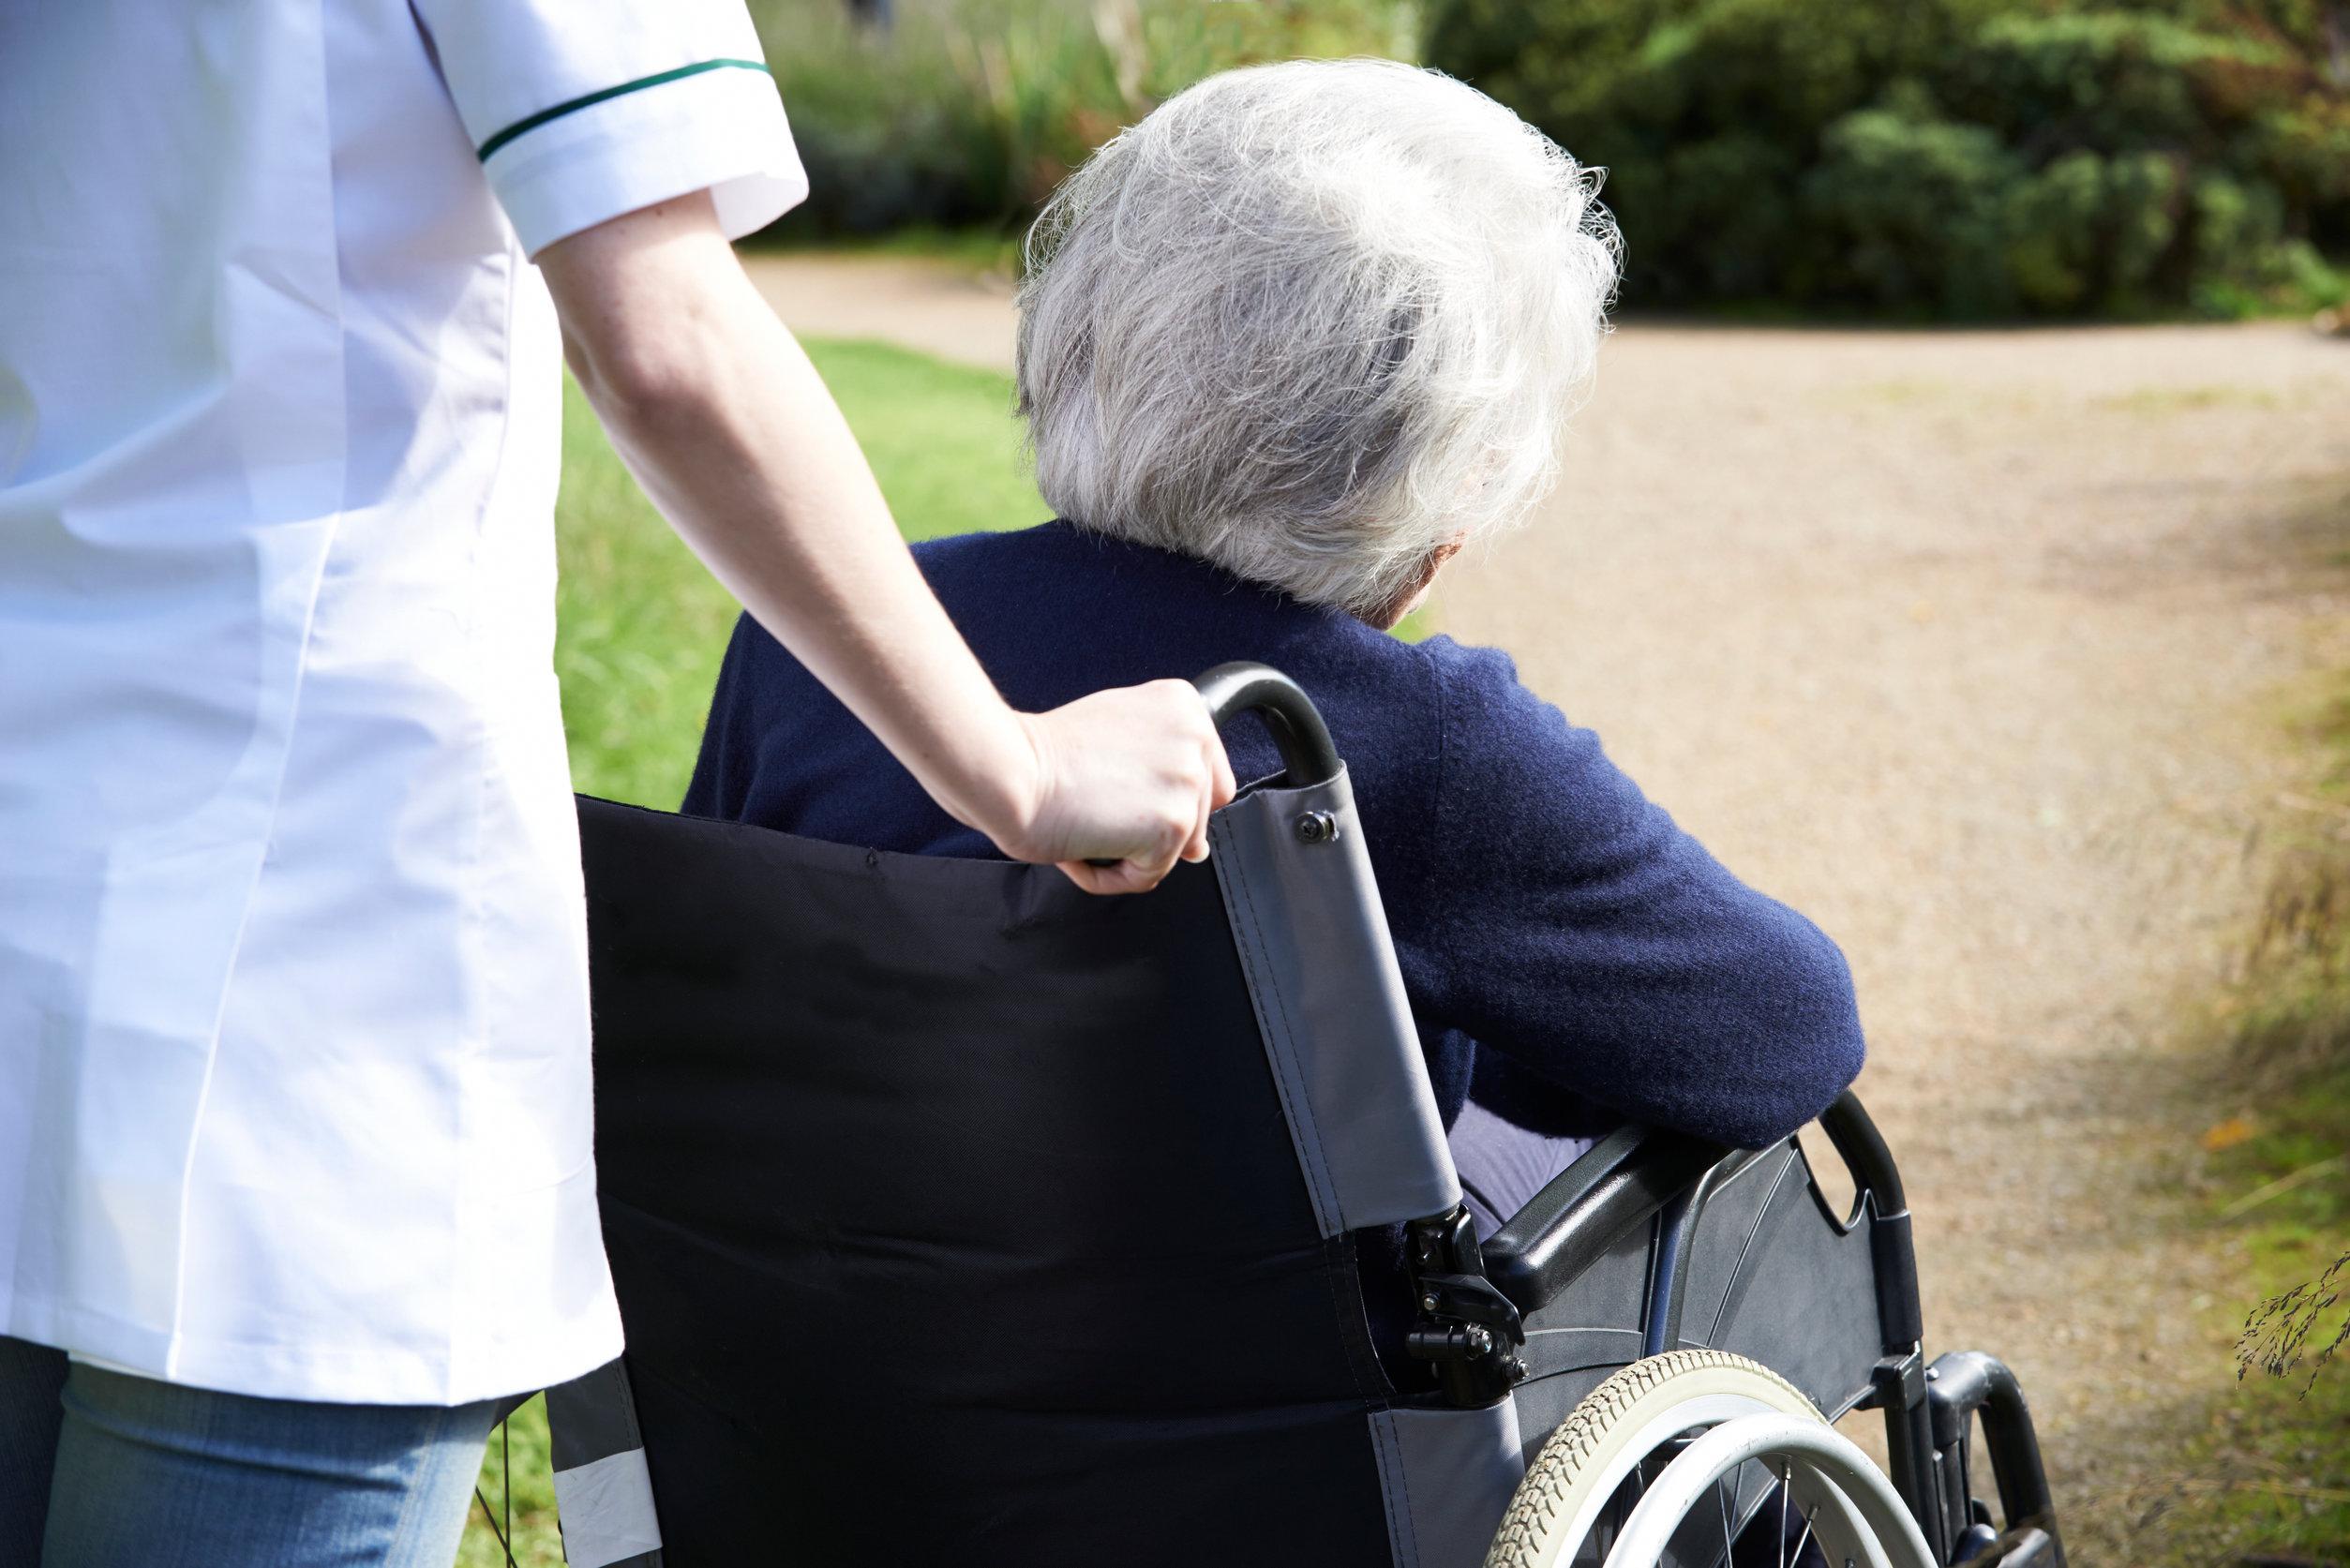 Manual handling in care homes